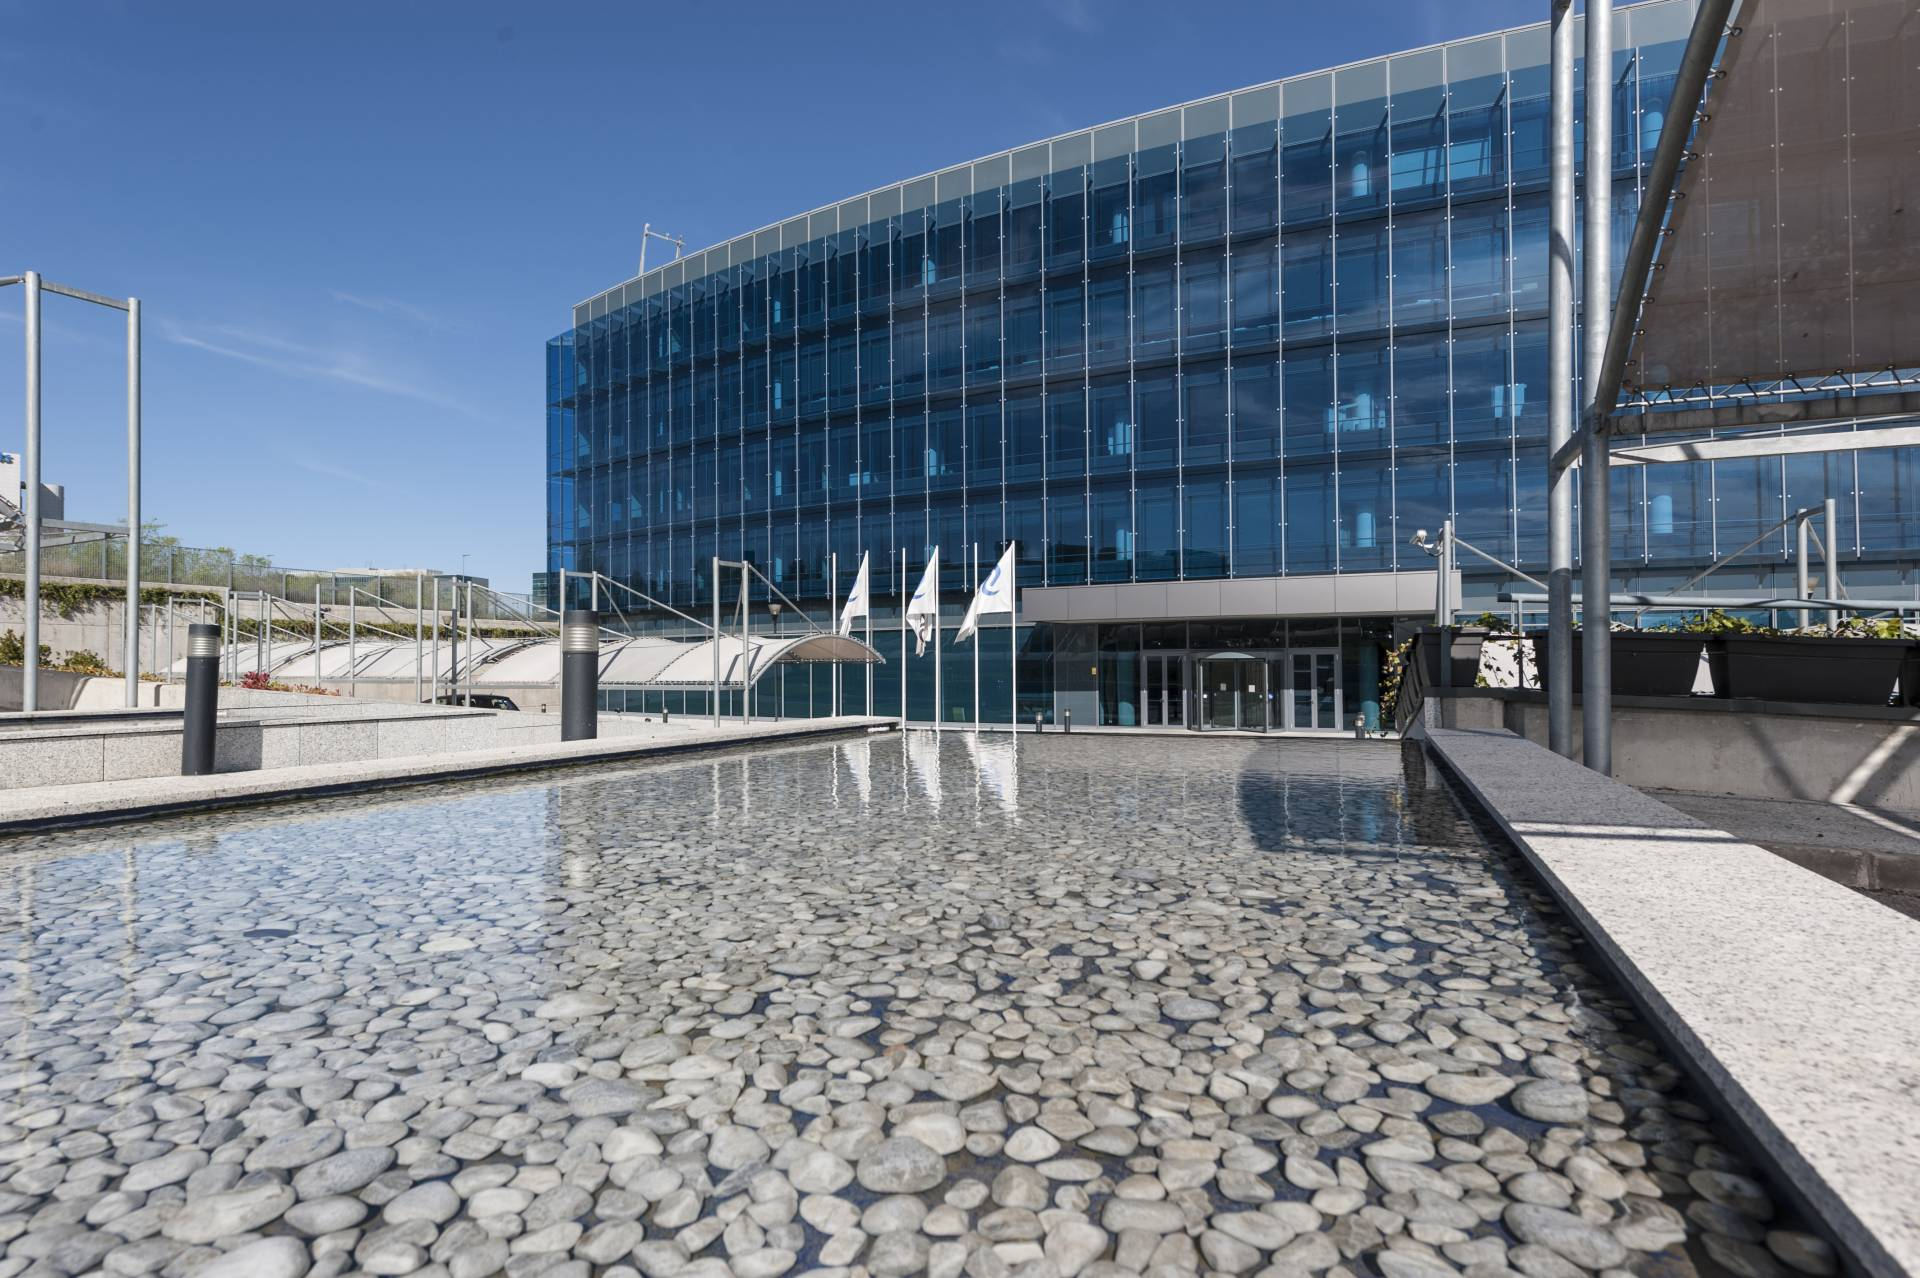 Edificio Aquamarina, un edificio de oficinas en Madrid de clase A.